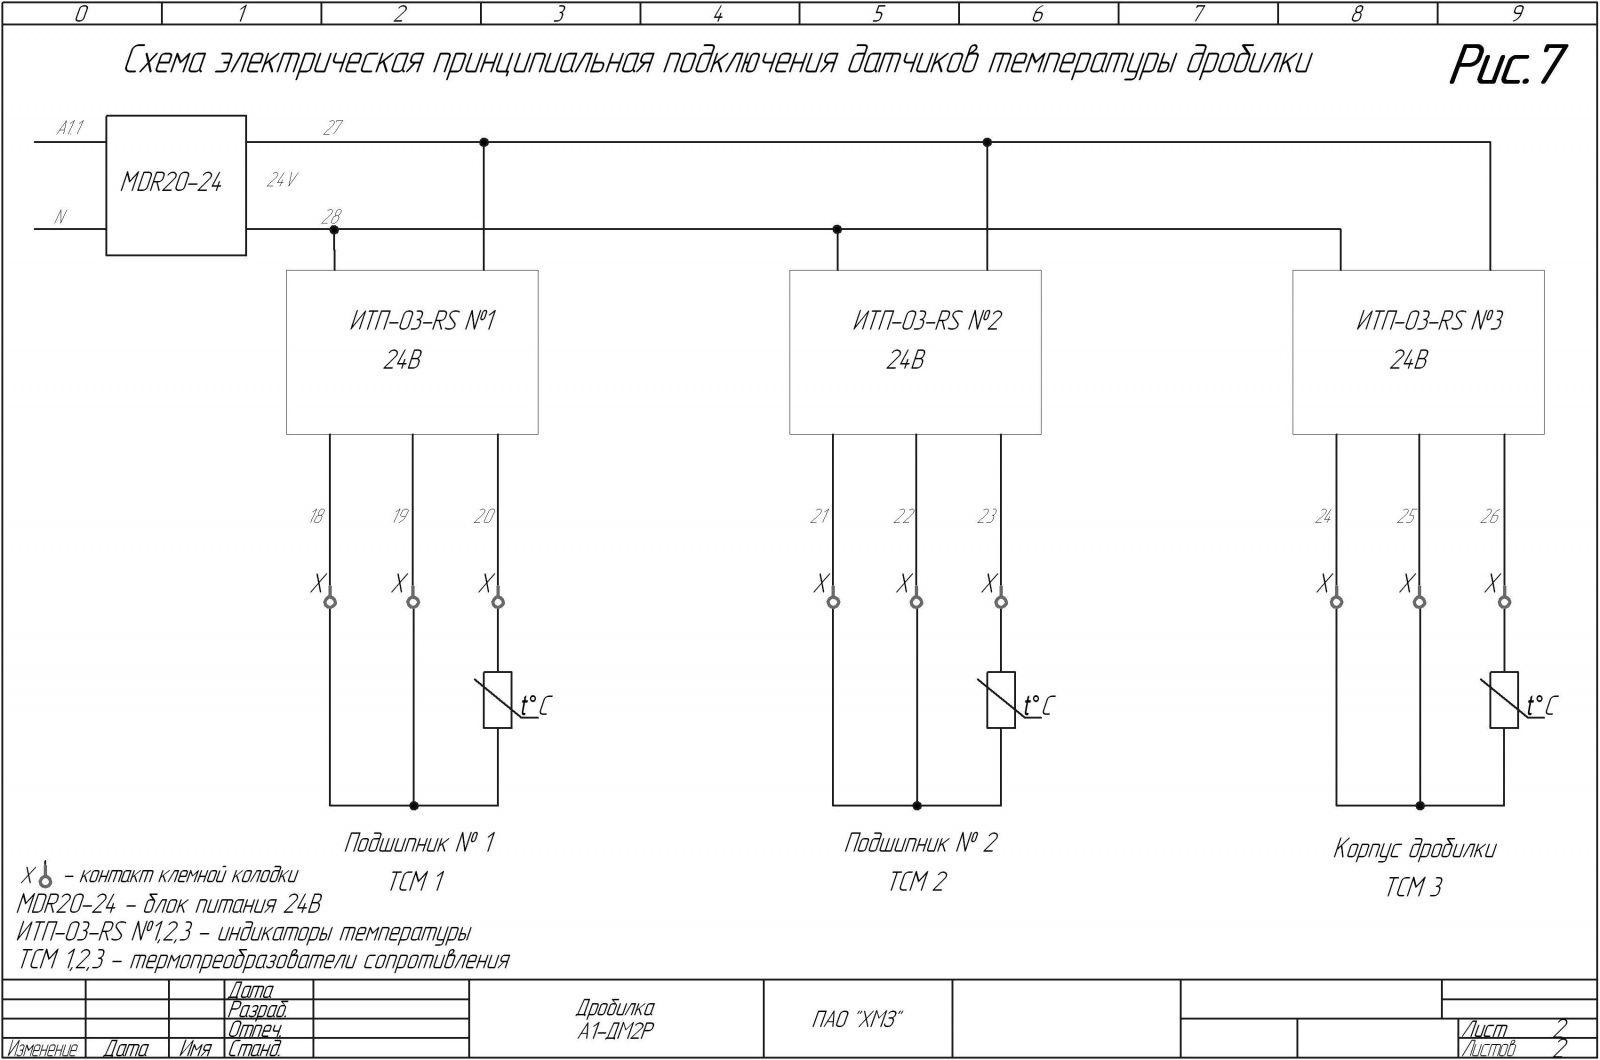 А1-ДМ2Р-557590110160 Датчики температуры др(A4) Рис. 7 .jpg